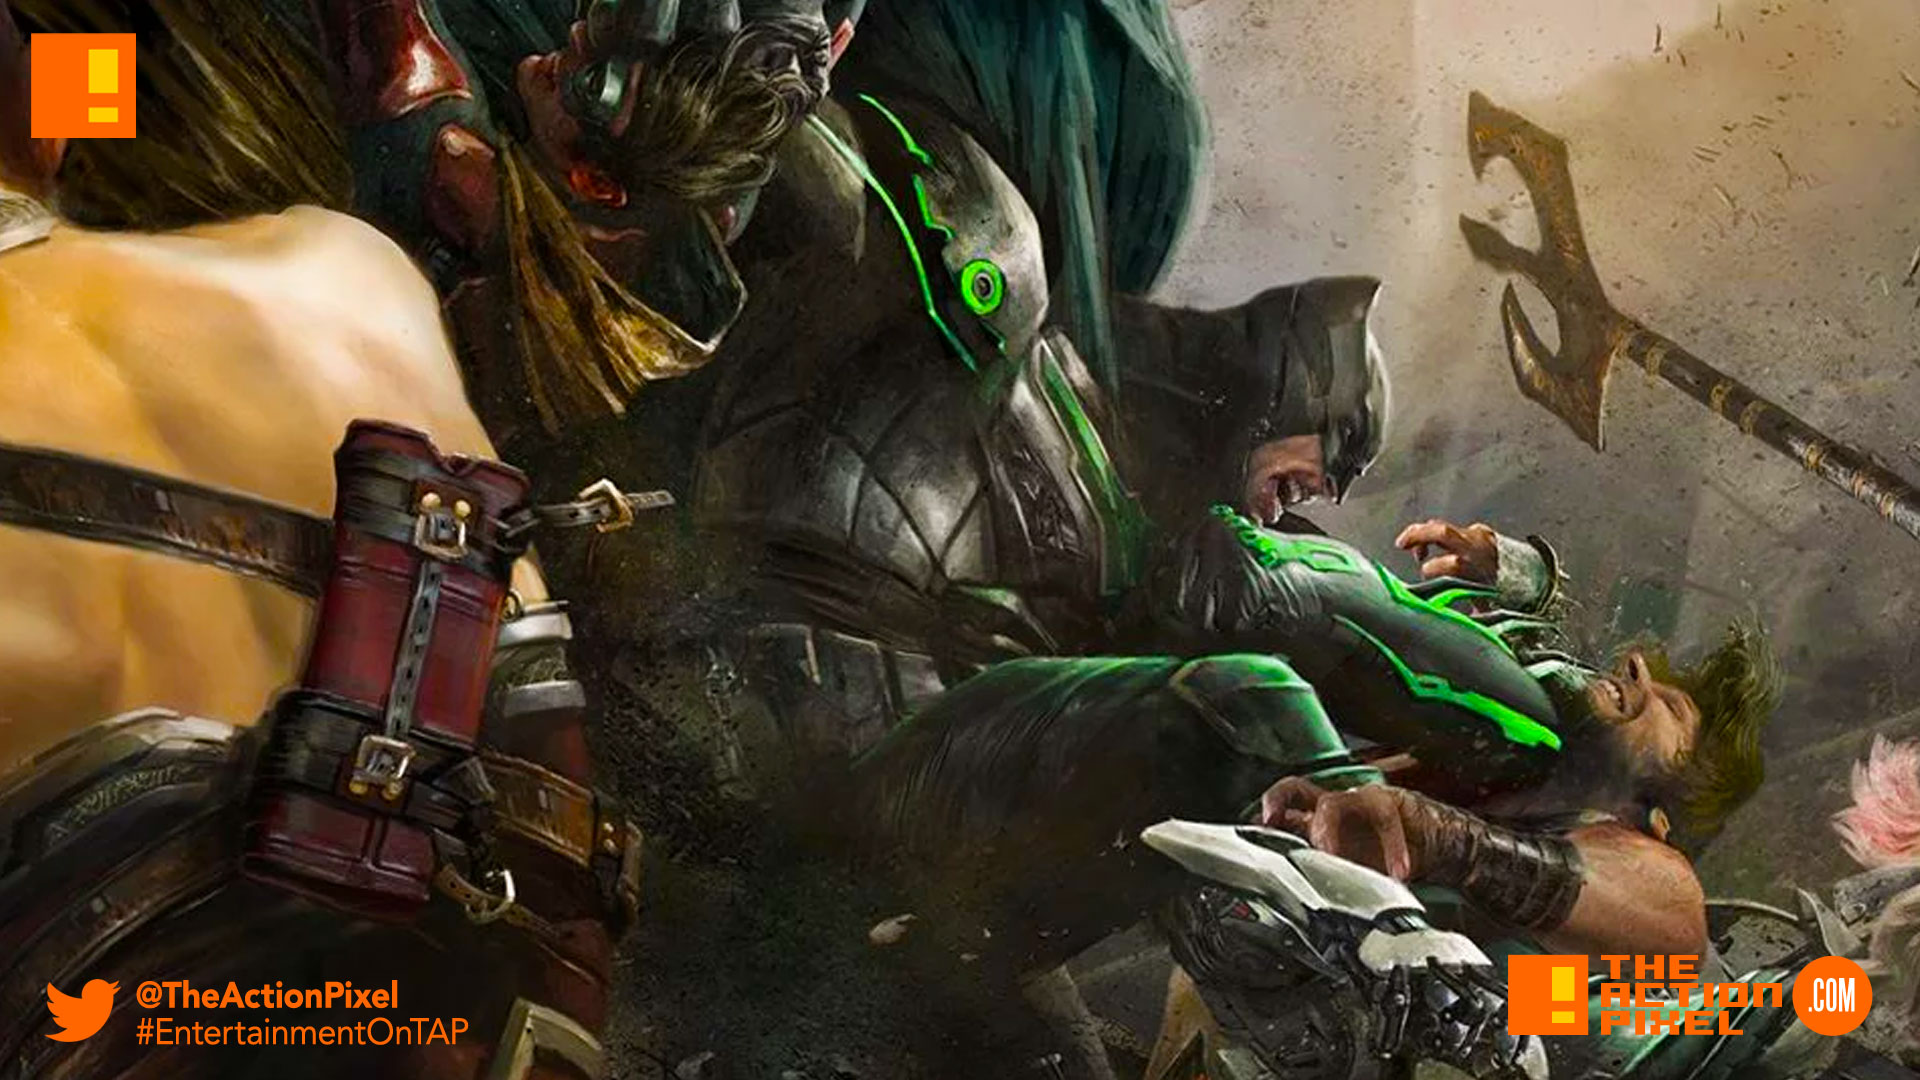 batman, injustice 2, shattered alliances part 2, shattered alliances, batman, dc comics, wb games, netherrealm studios,